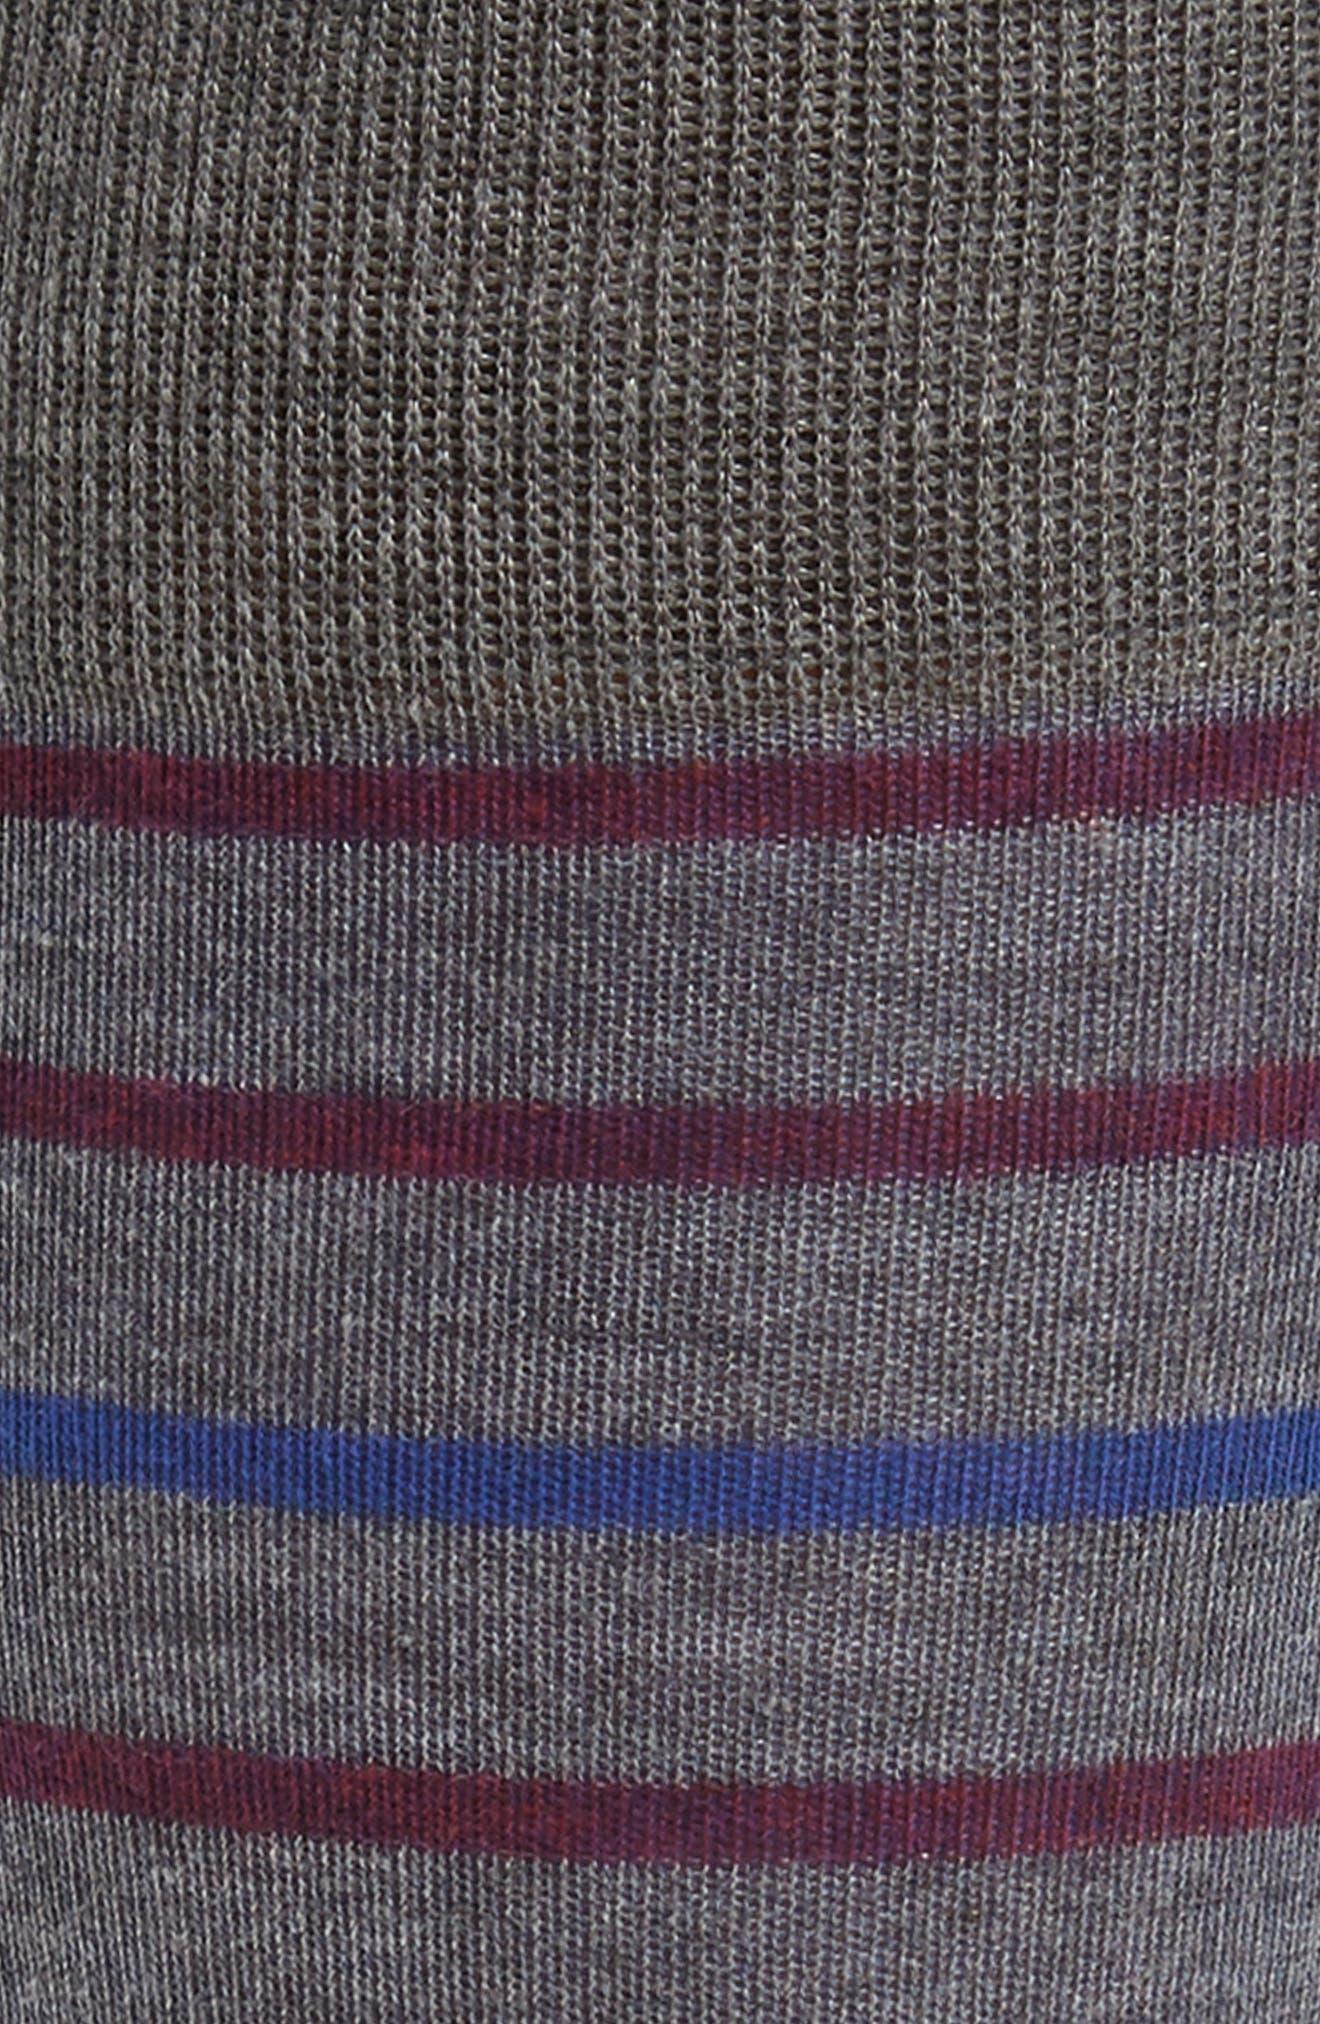 Stripe Socks,                             Alternate thumbnail 4, color,